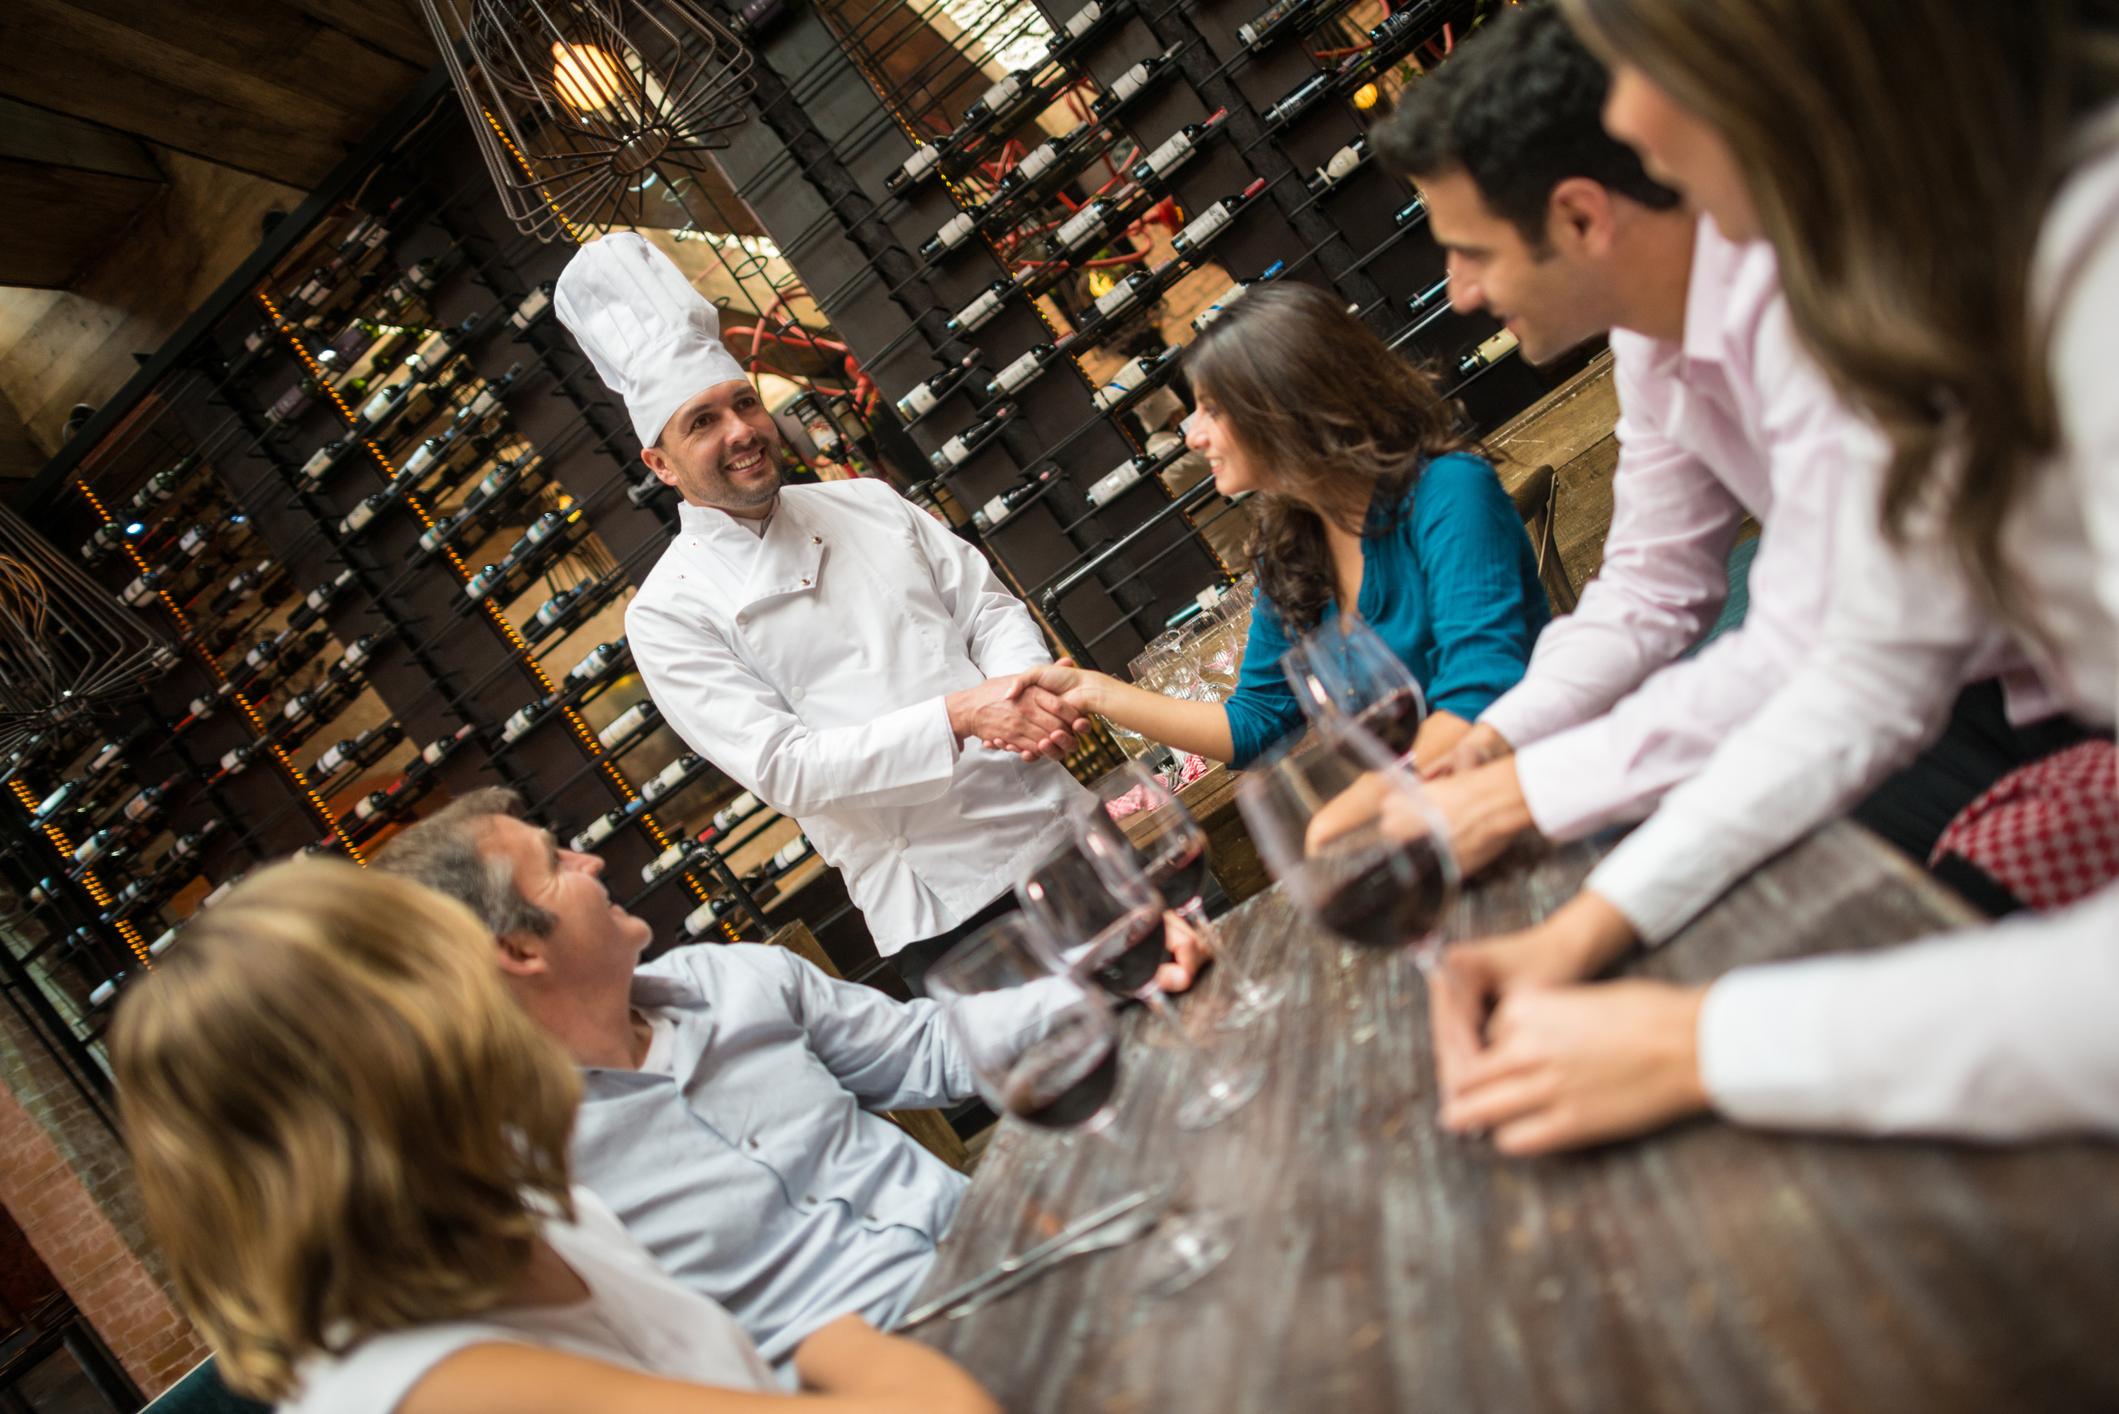 Clientes cumprimentando o chef